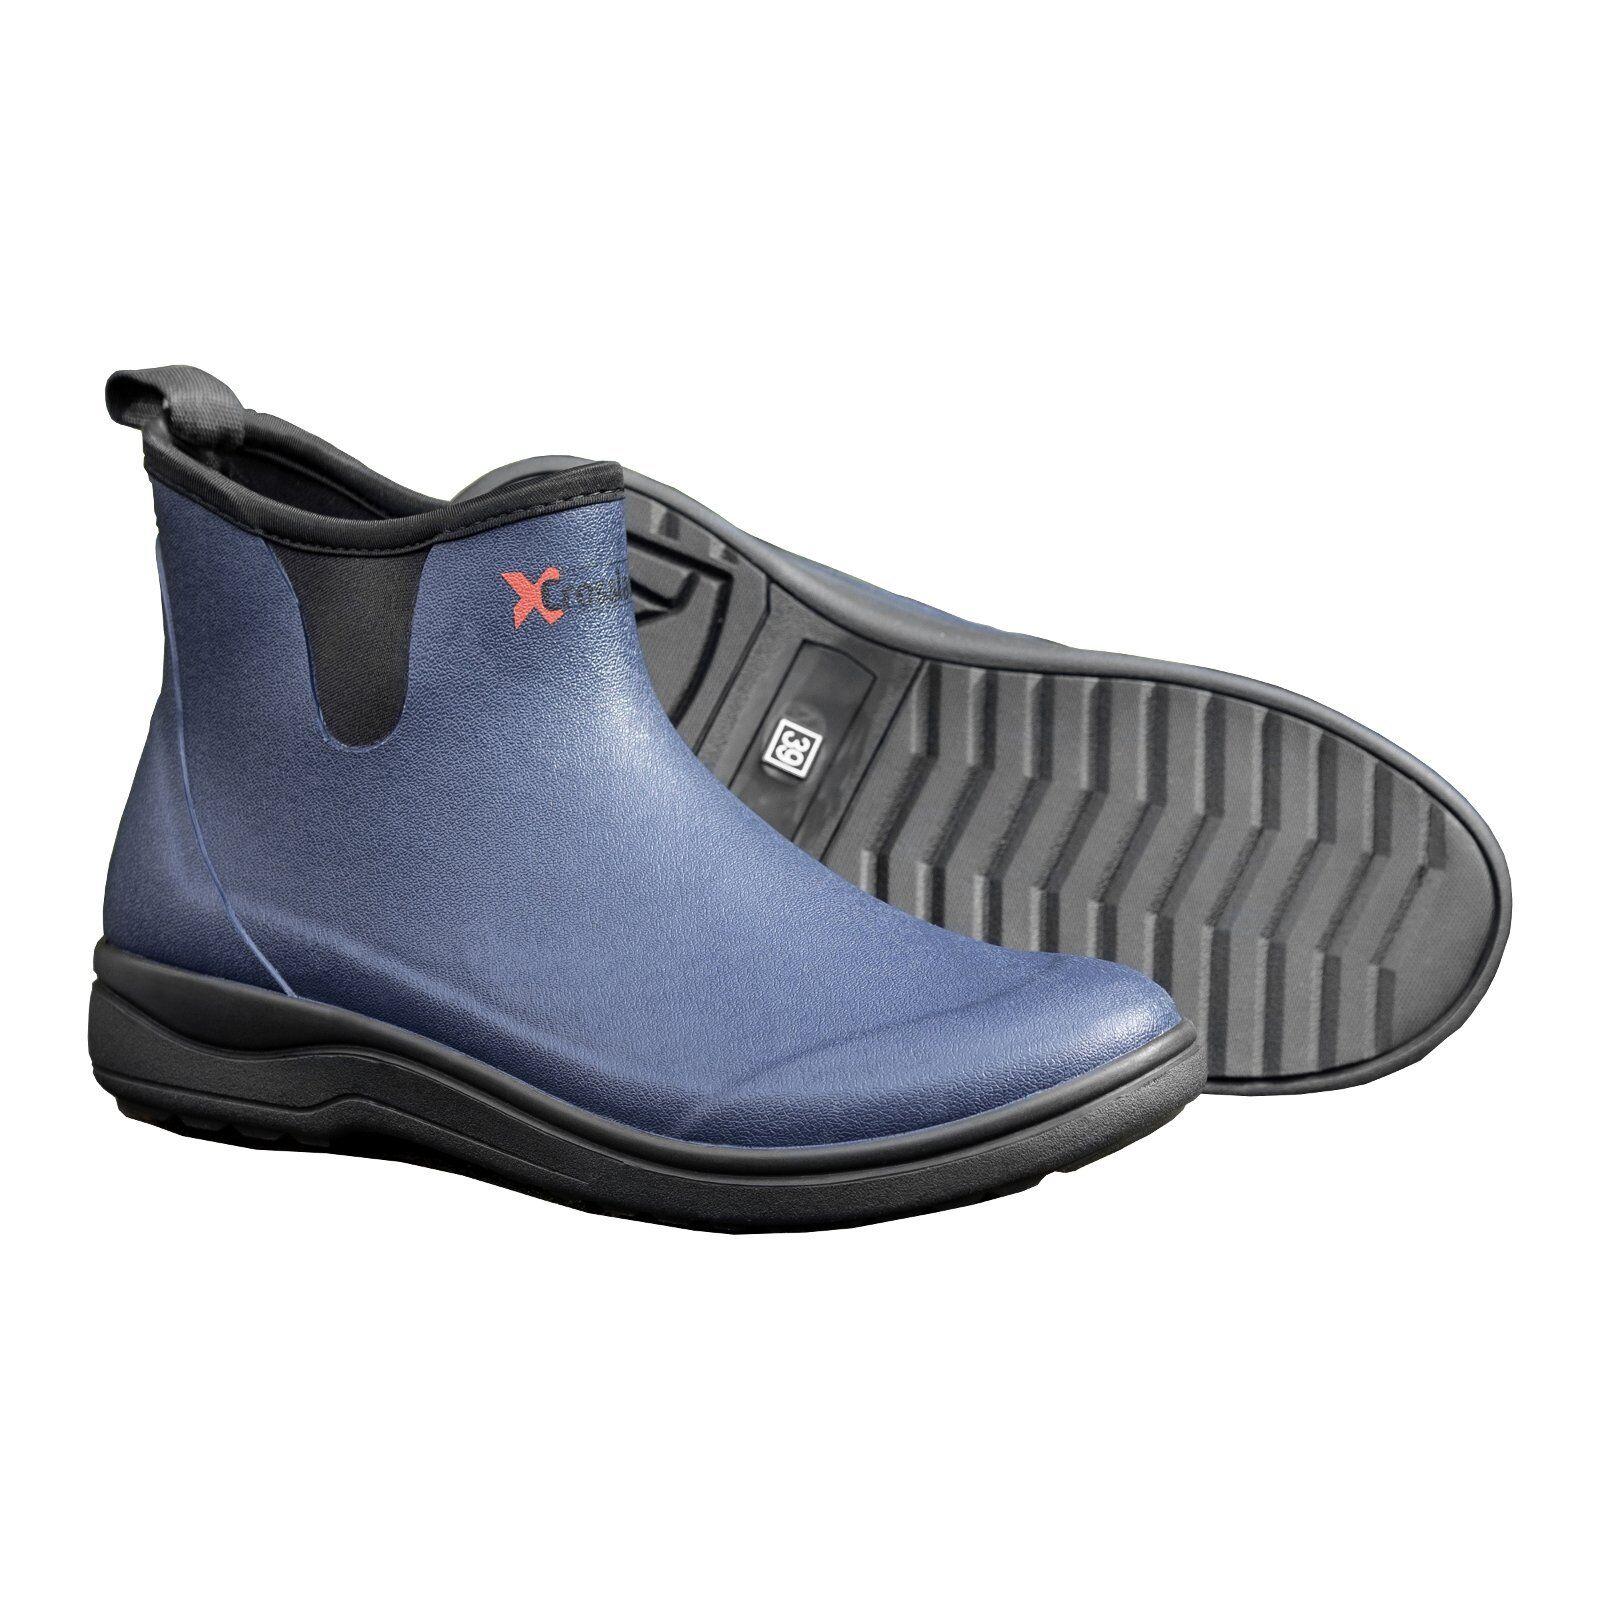 Crosslander Outdoor Stiefel Malmö marine 40 Gummistiefel Regenstiefel Schuhe